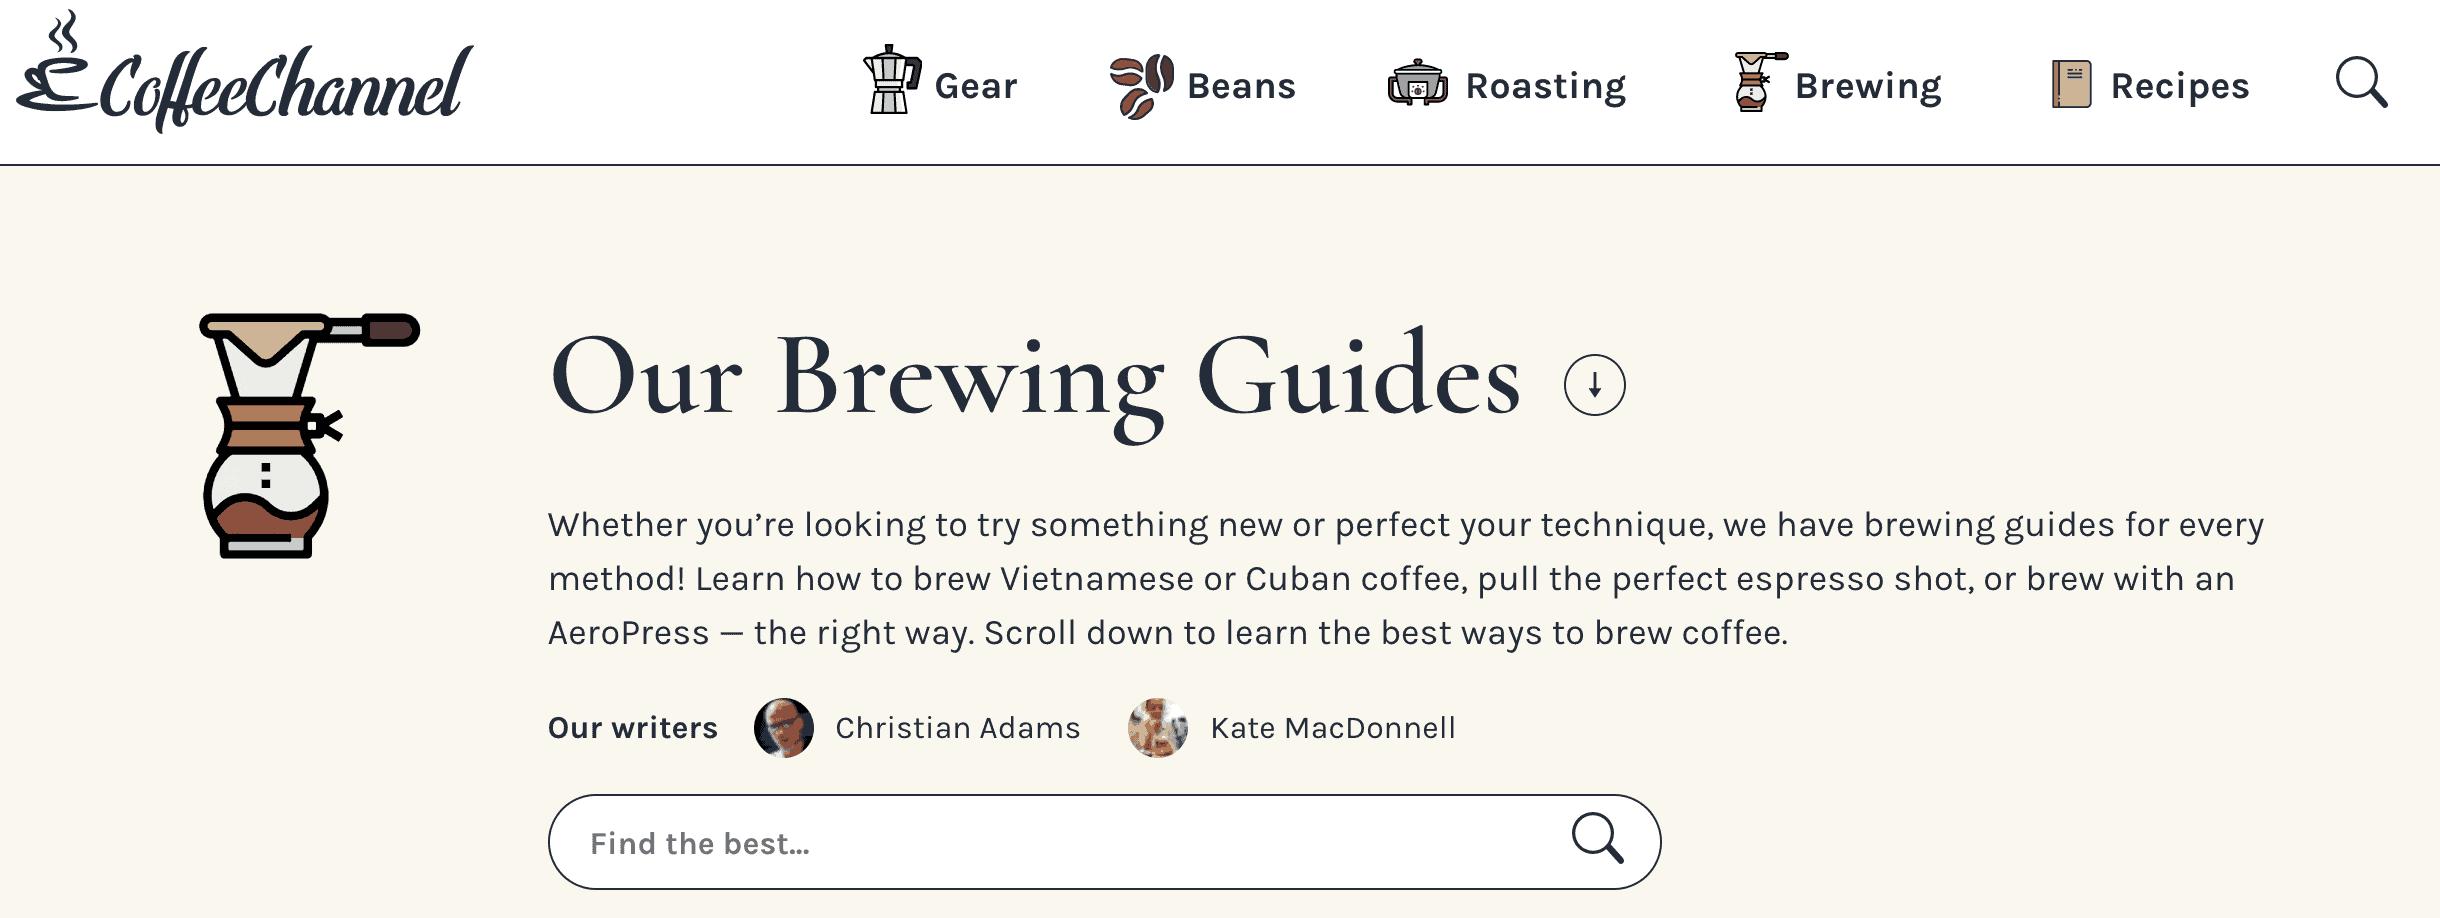 Coffee-Channel blog